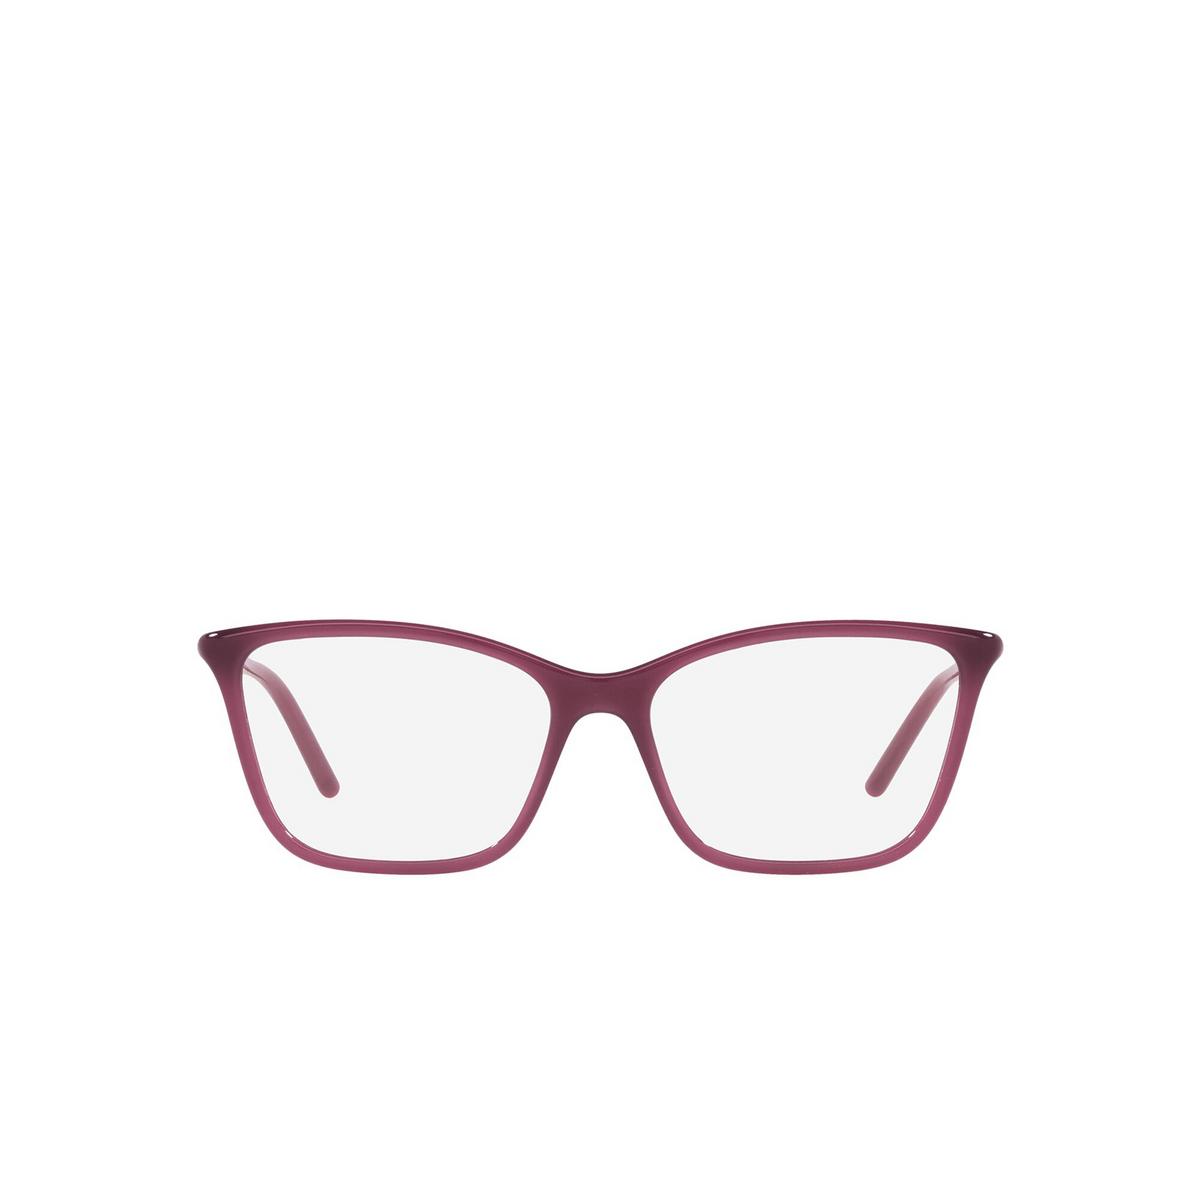 Prada® Cat-eye Eyeglasses: PR 08WV color Opal Bordeaux 2BM1O1 - front view.